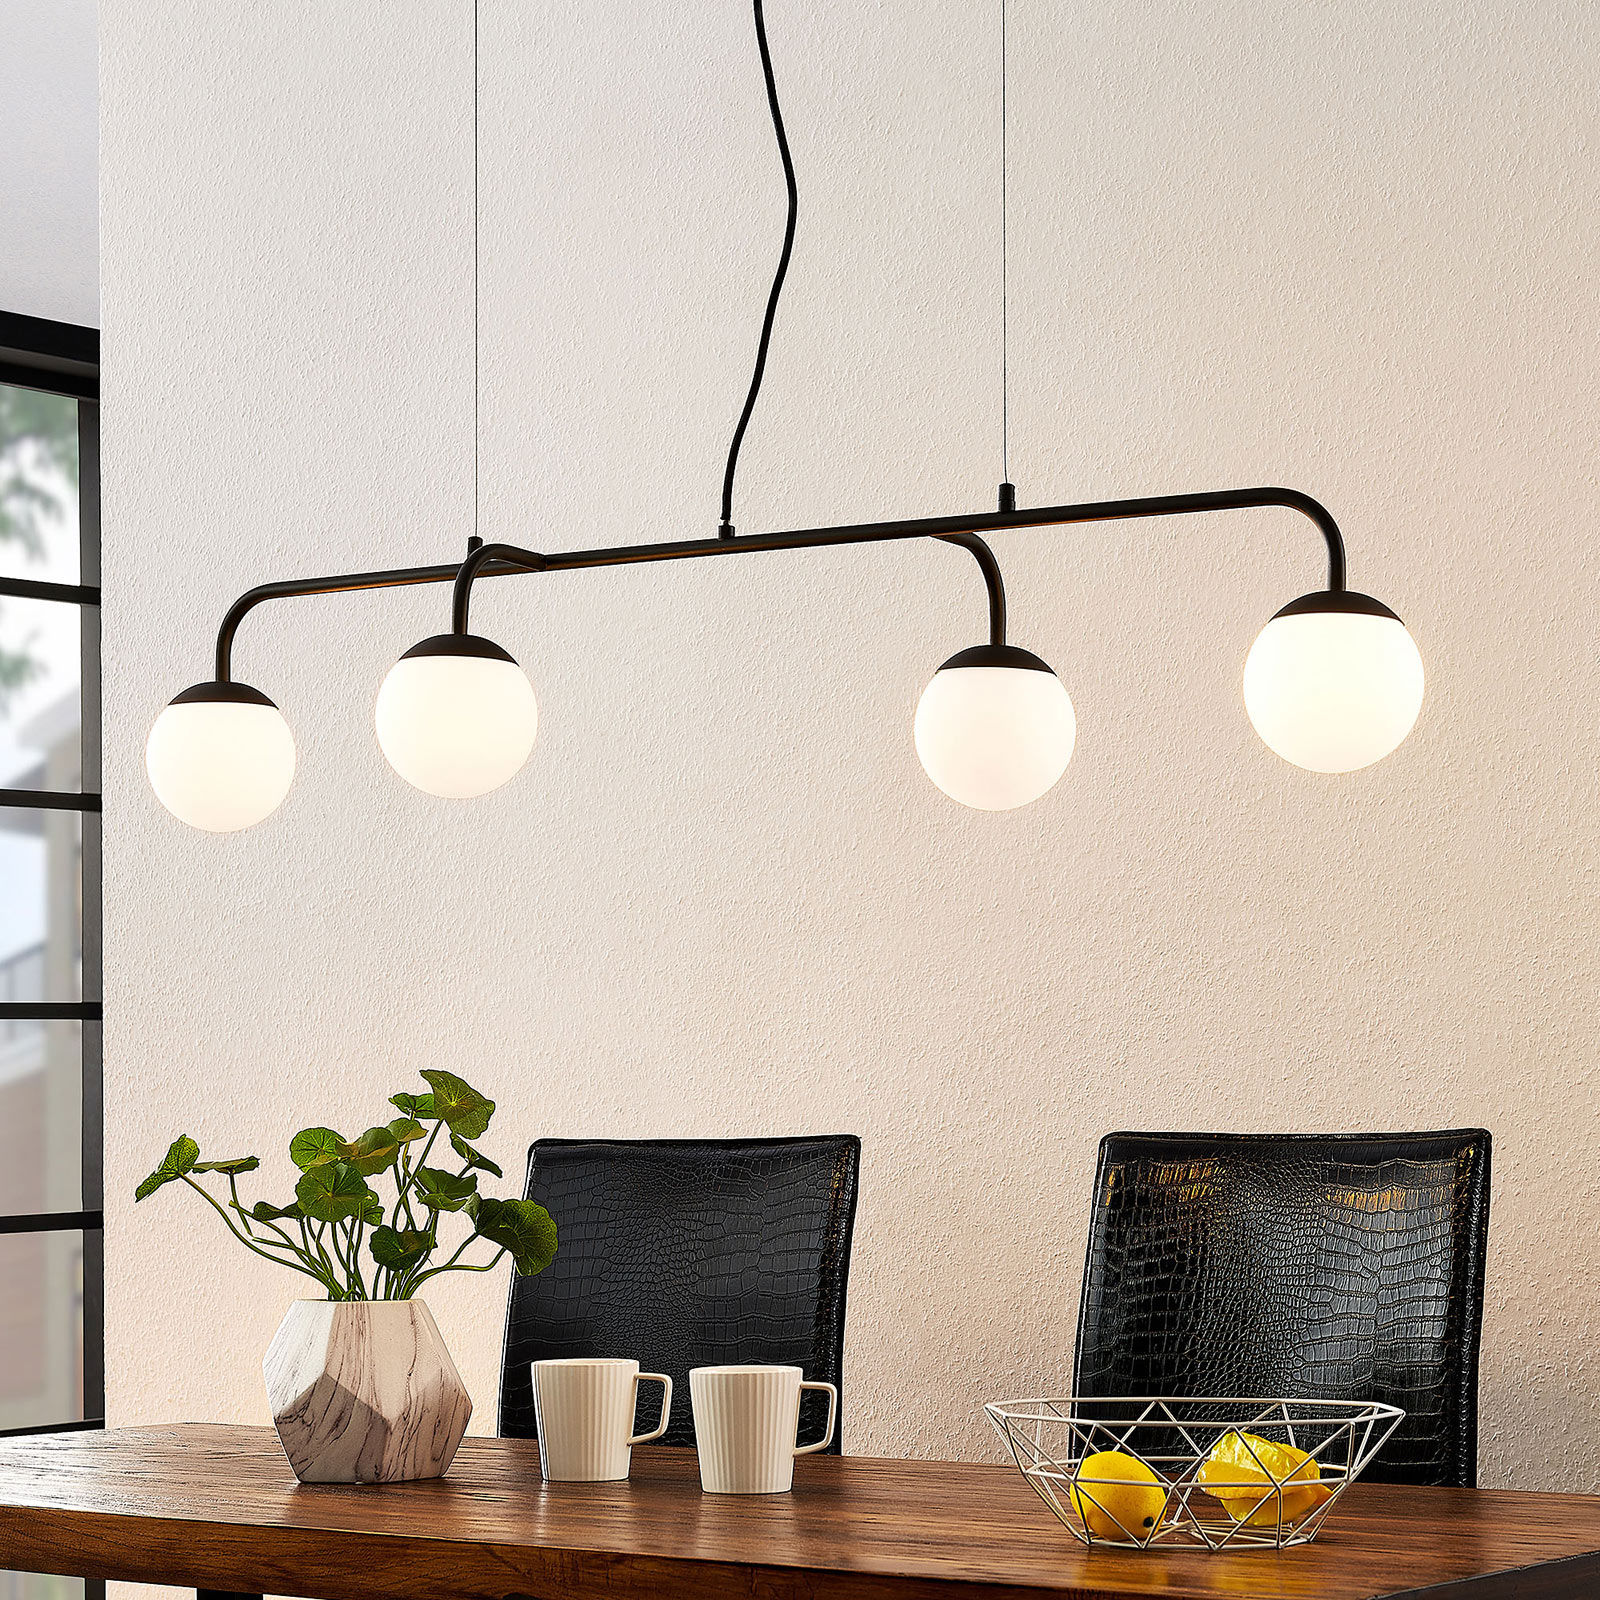 Lucande Rama lampa wisząca LED szklane klosze